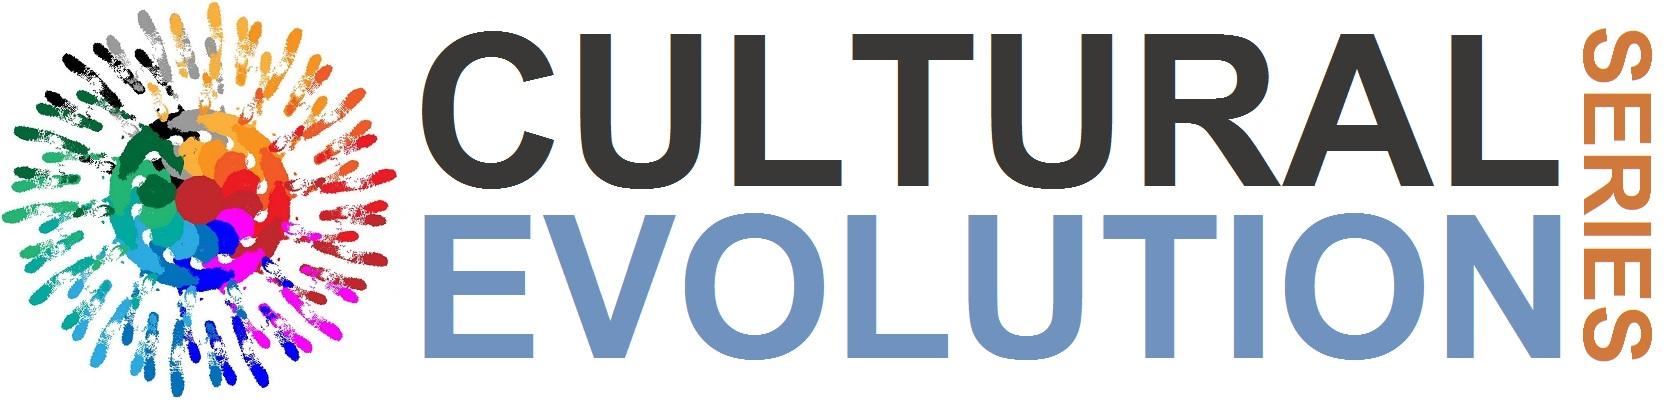 cultural_evolution_series_logo1